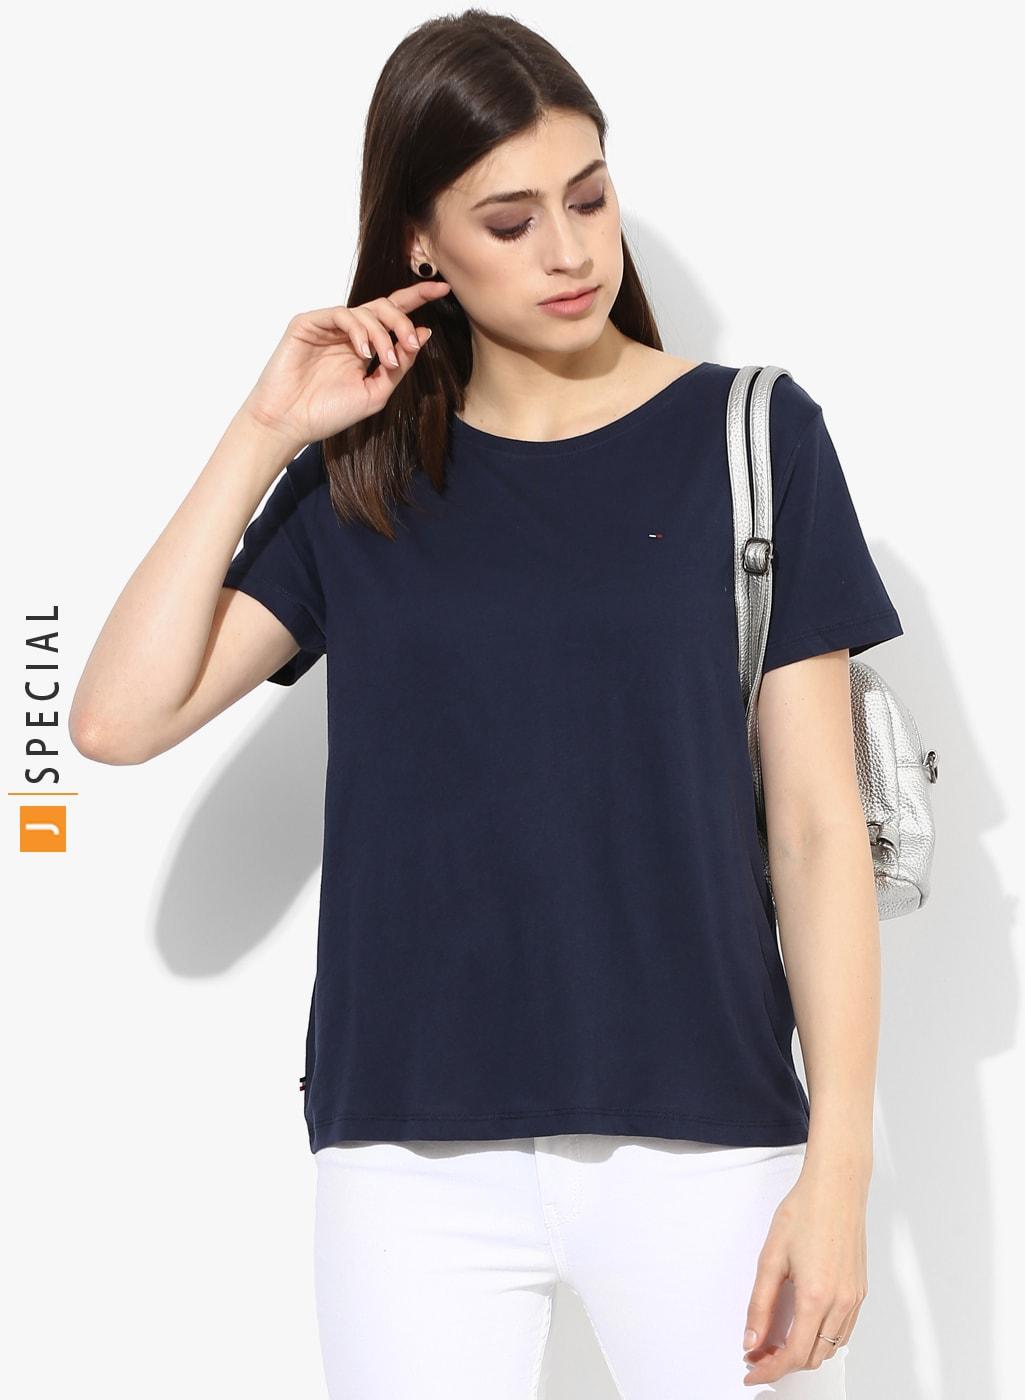 b17e599cd35d3 Women Apparel Tops Tees Shirts - Buy Women Apparel Tops Tees Shirts online  in India - Jabong